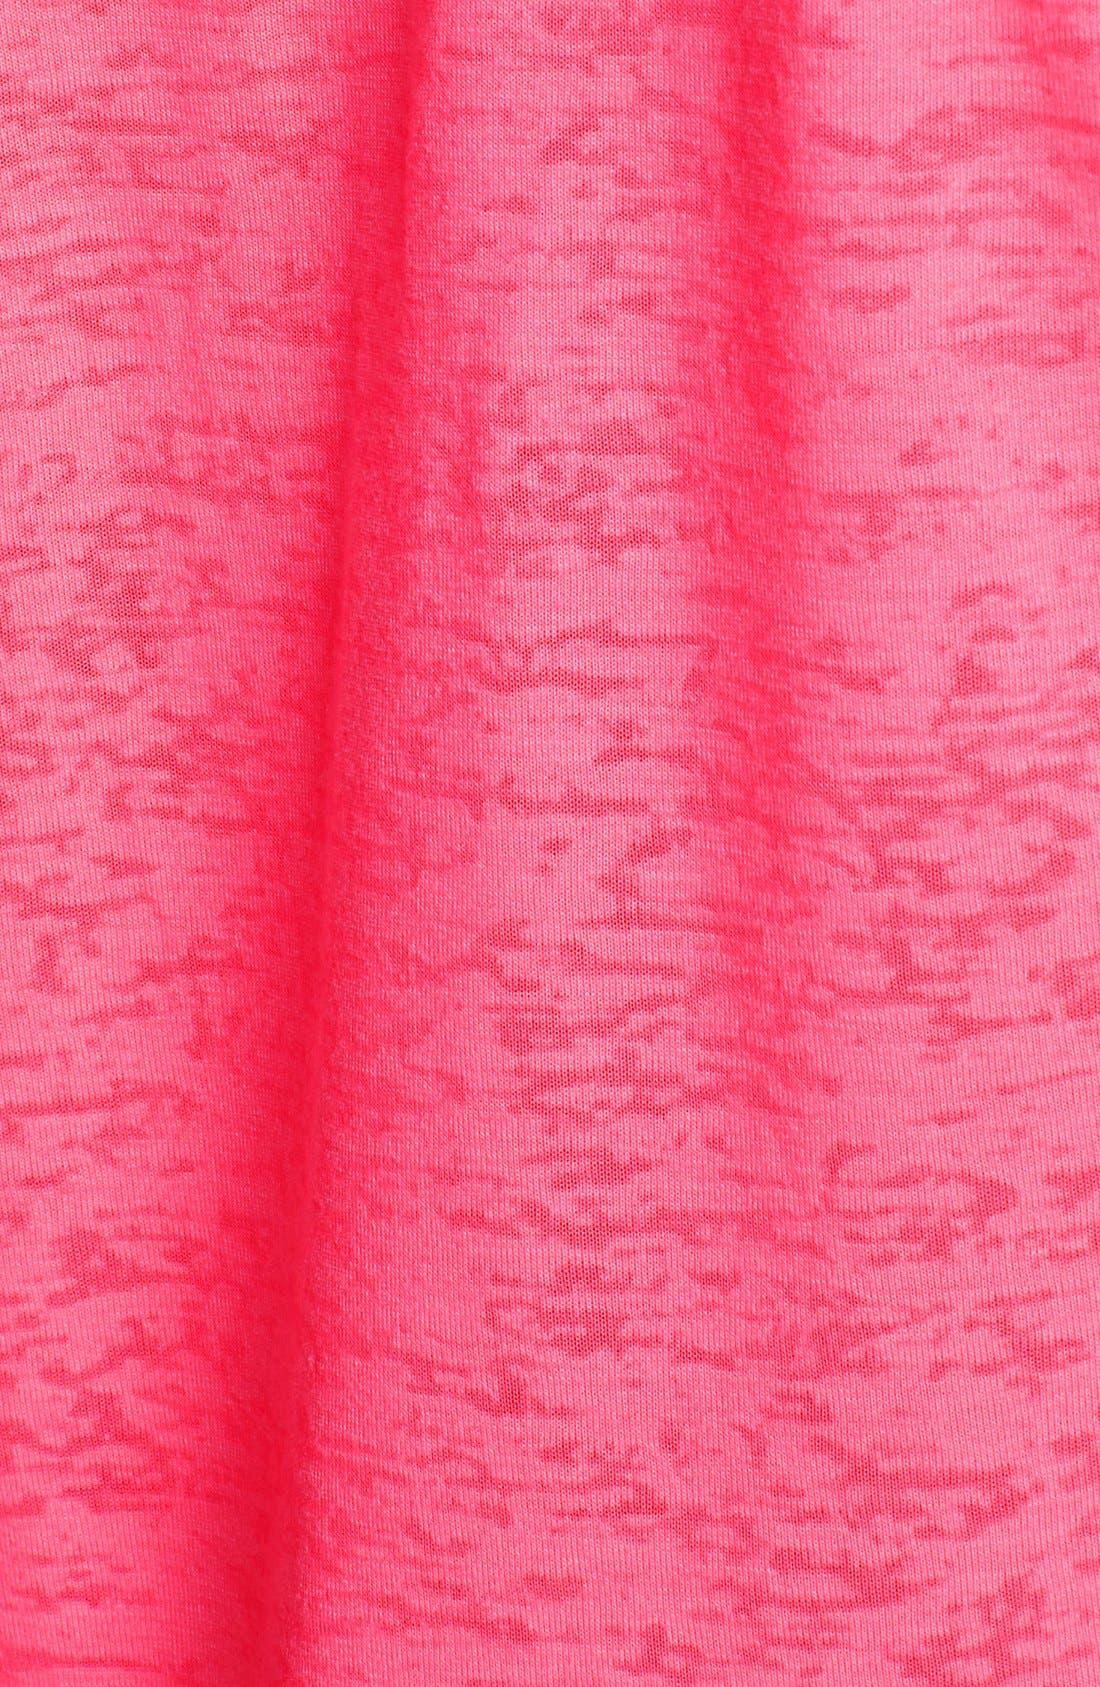 Alternate Image 3  - Under Armour 'Power in Pink Achieve' Tee